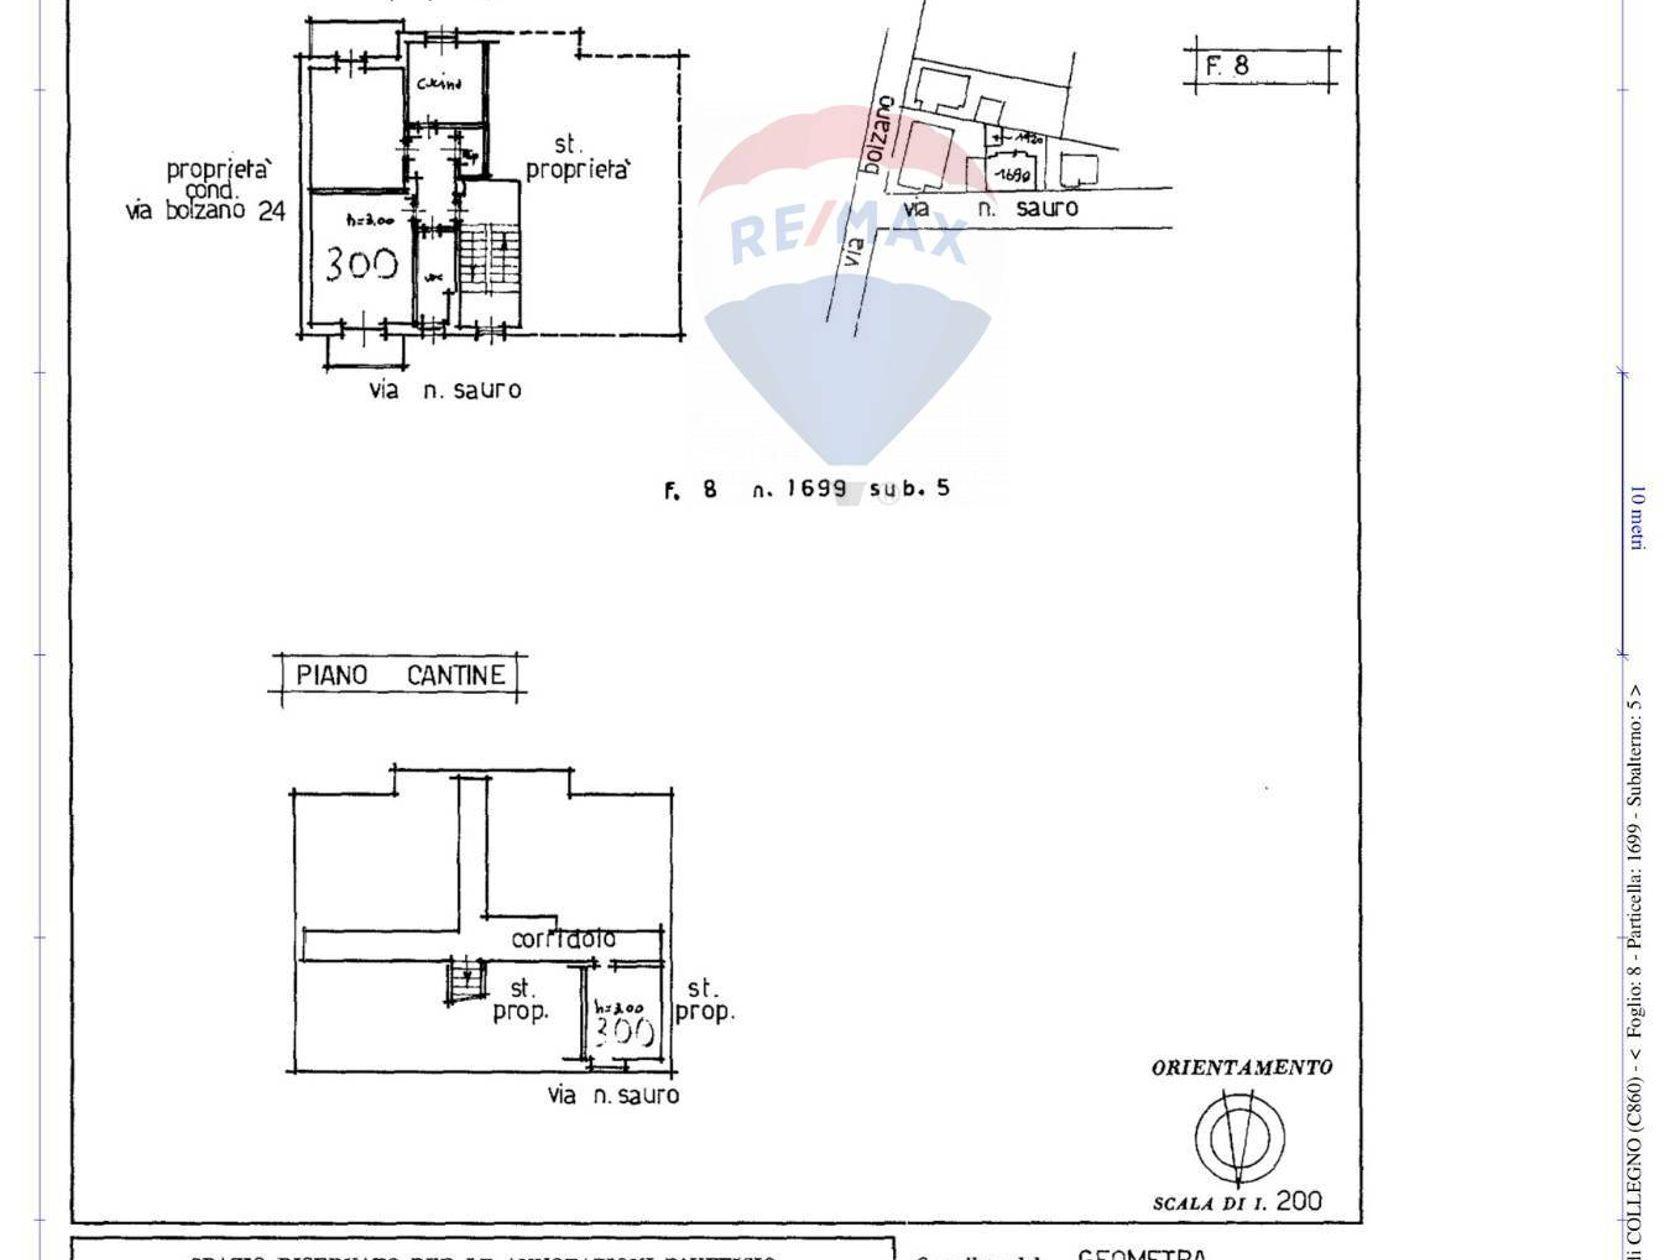 Casa Indipendente Santa Maria, Collegno, TO Vendita - Planimetria 3